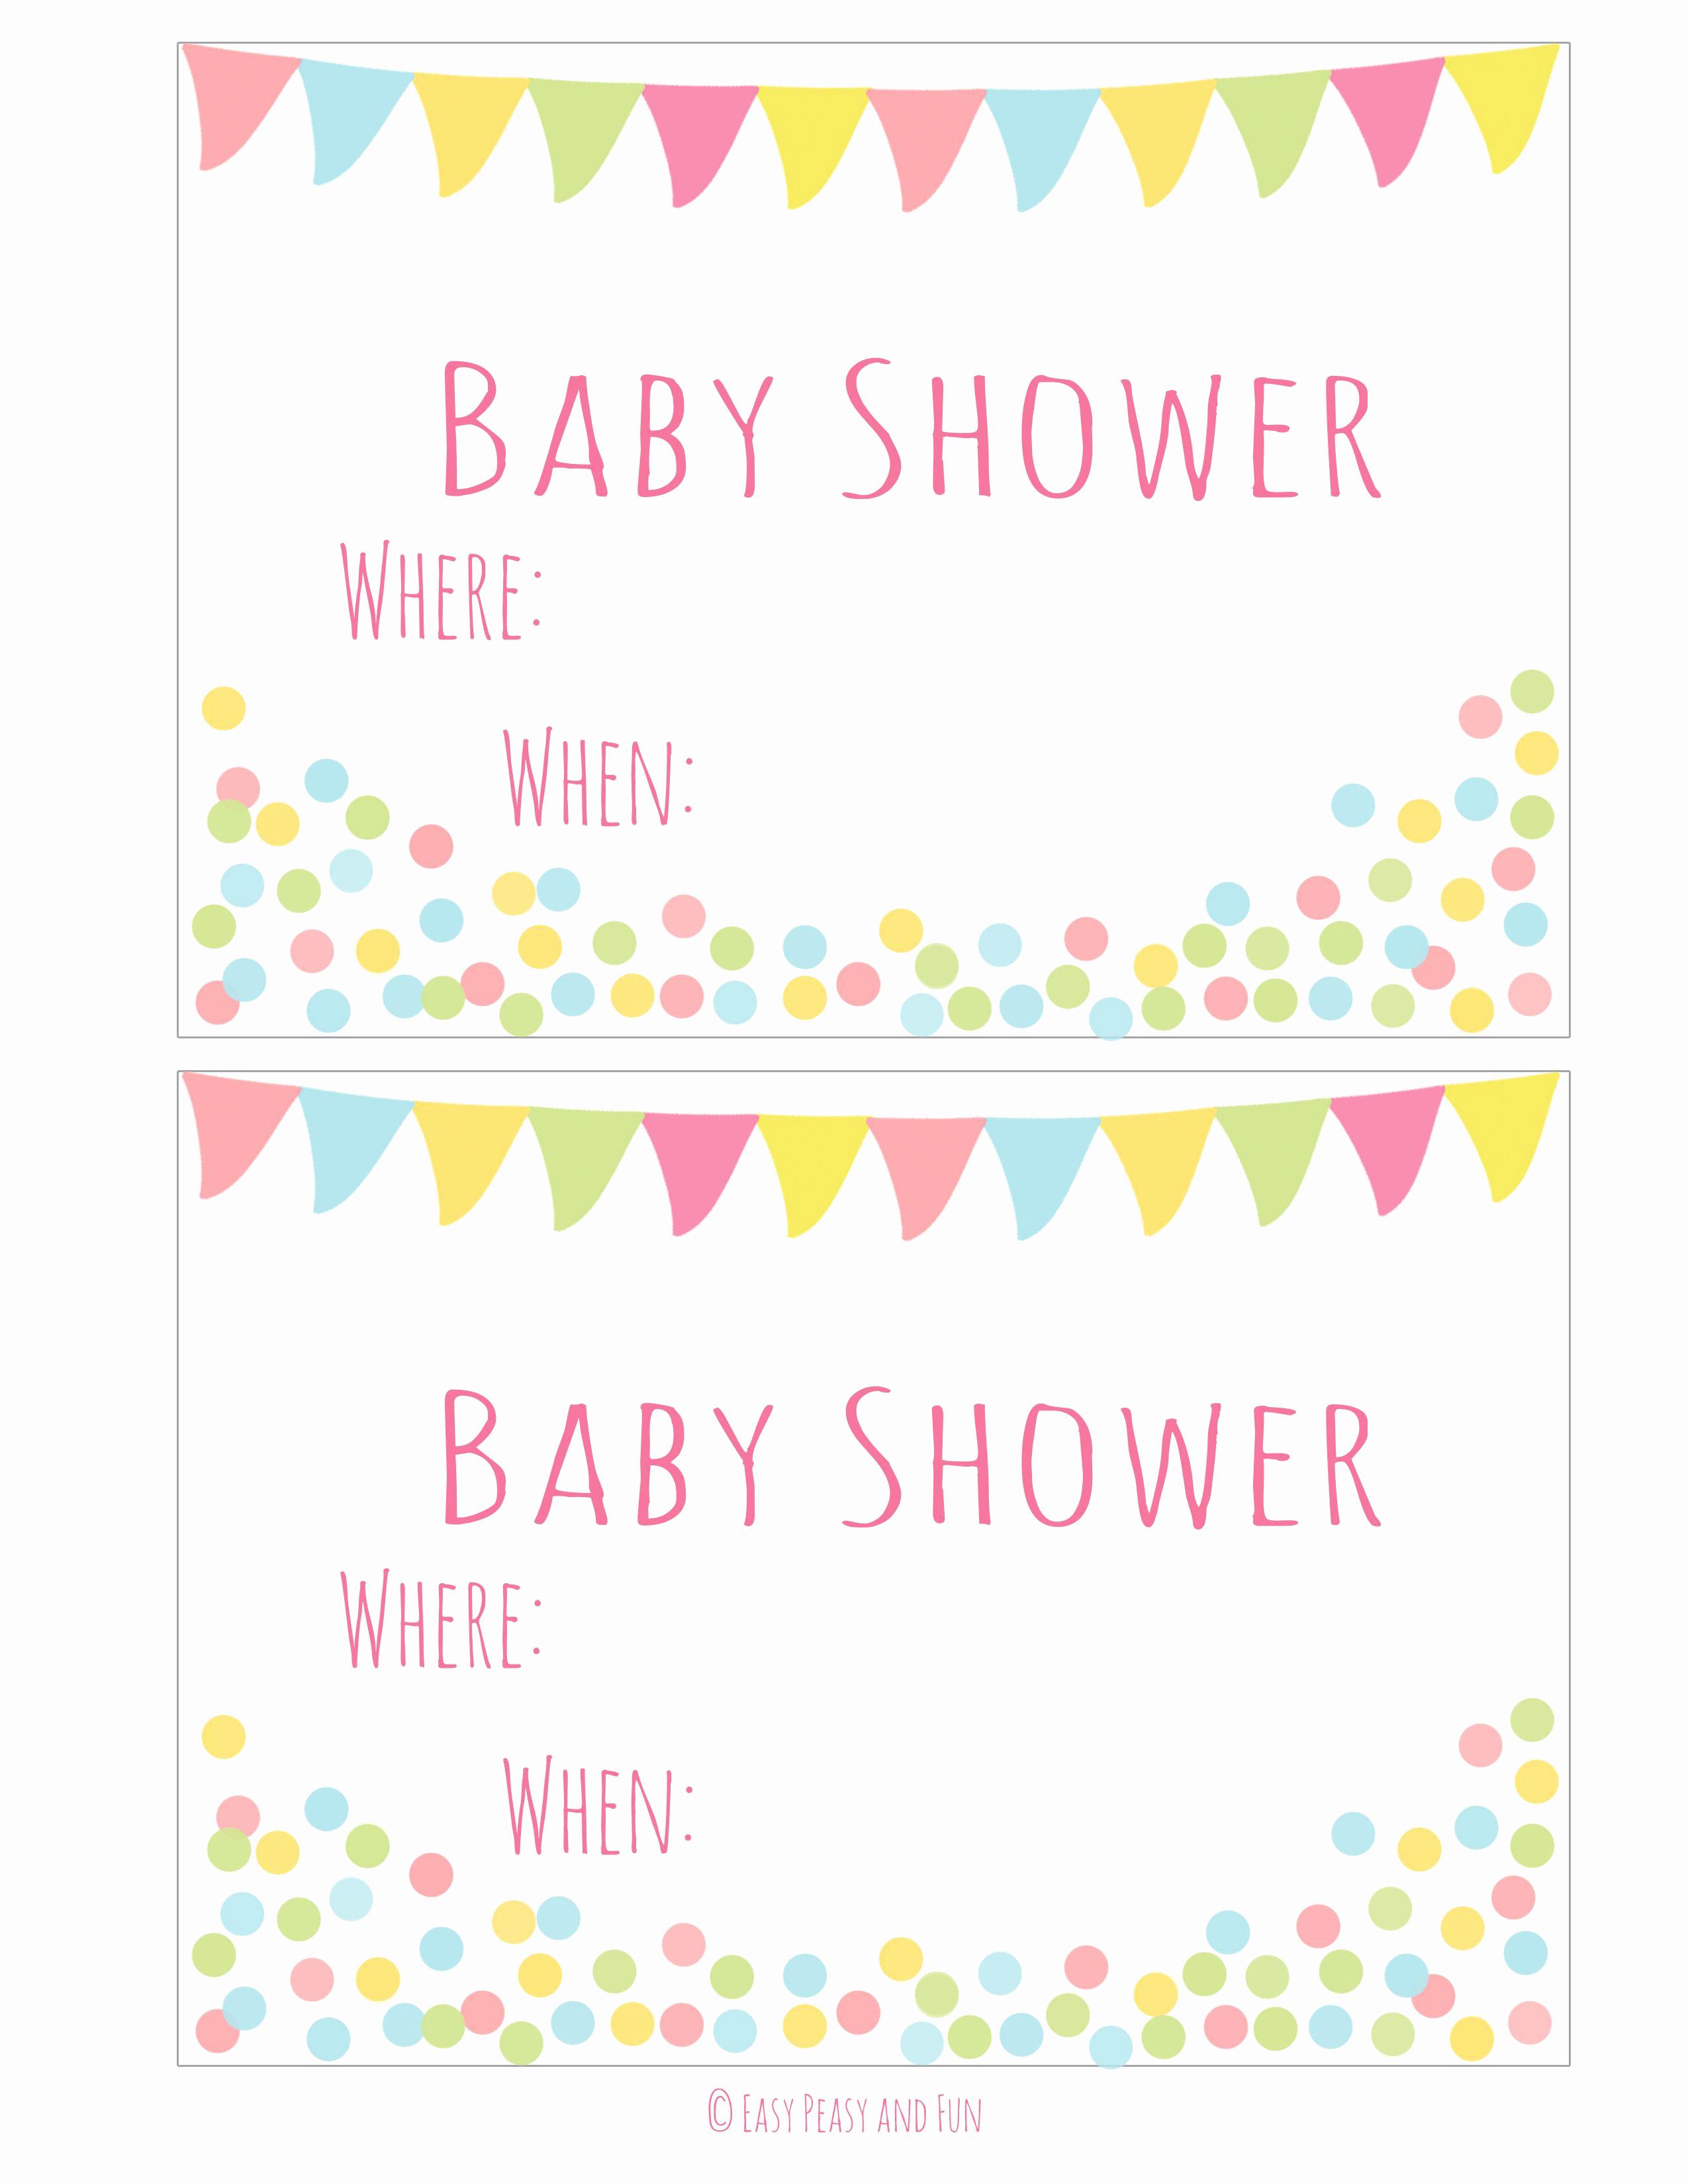 Baby Shower Invitation Printable Beautiful Birthday Invitation Mickey Mouse Birthday Invitations